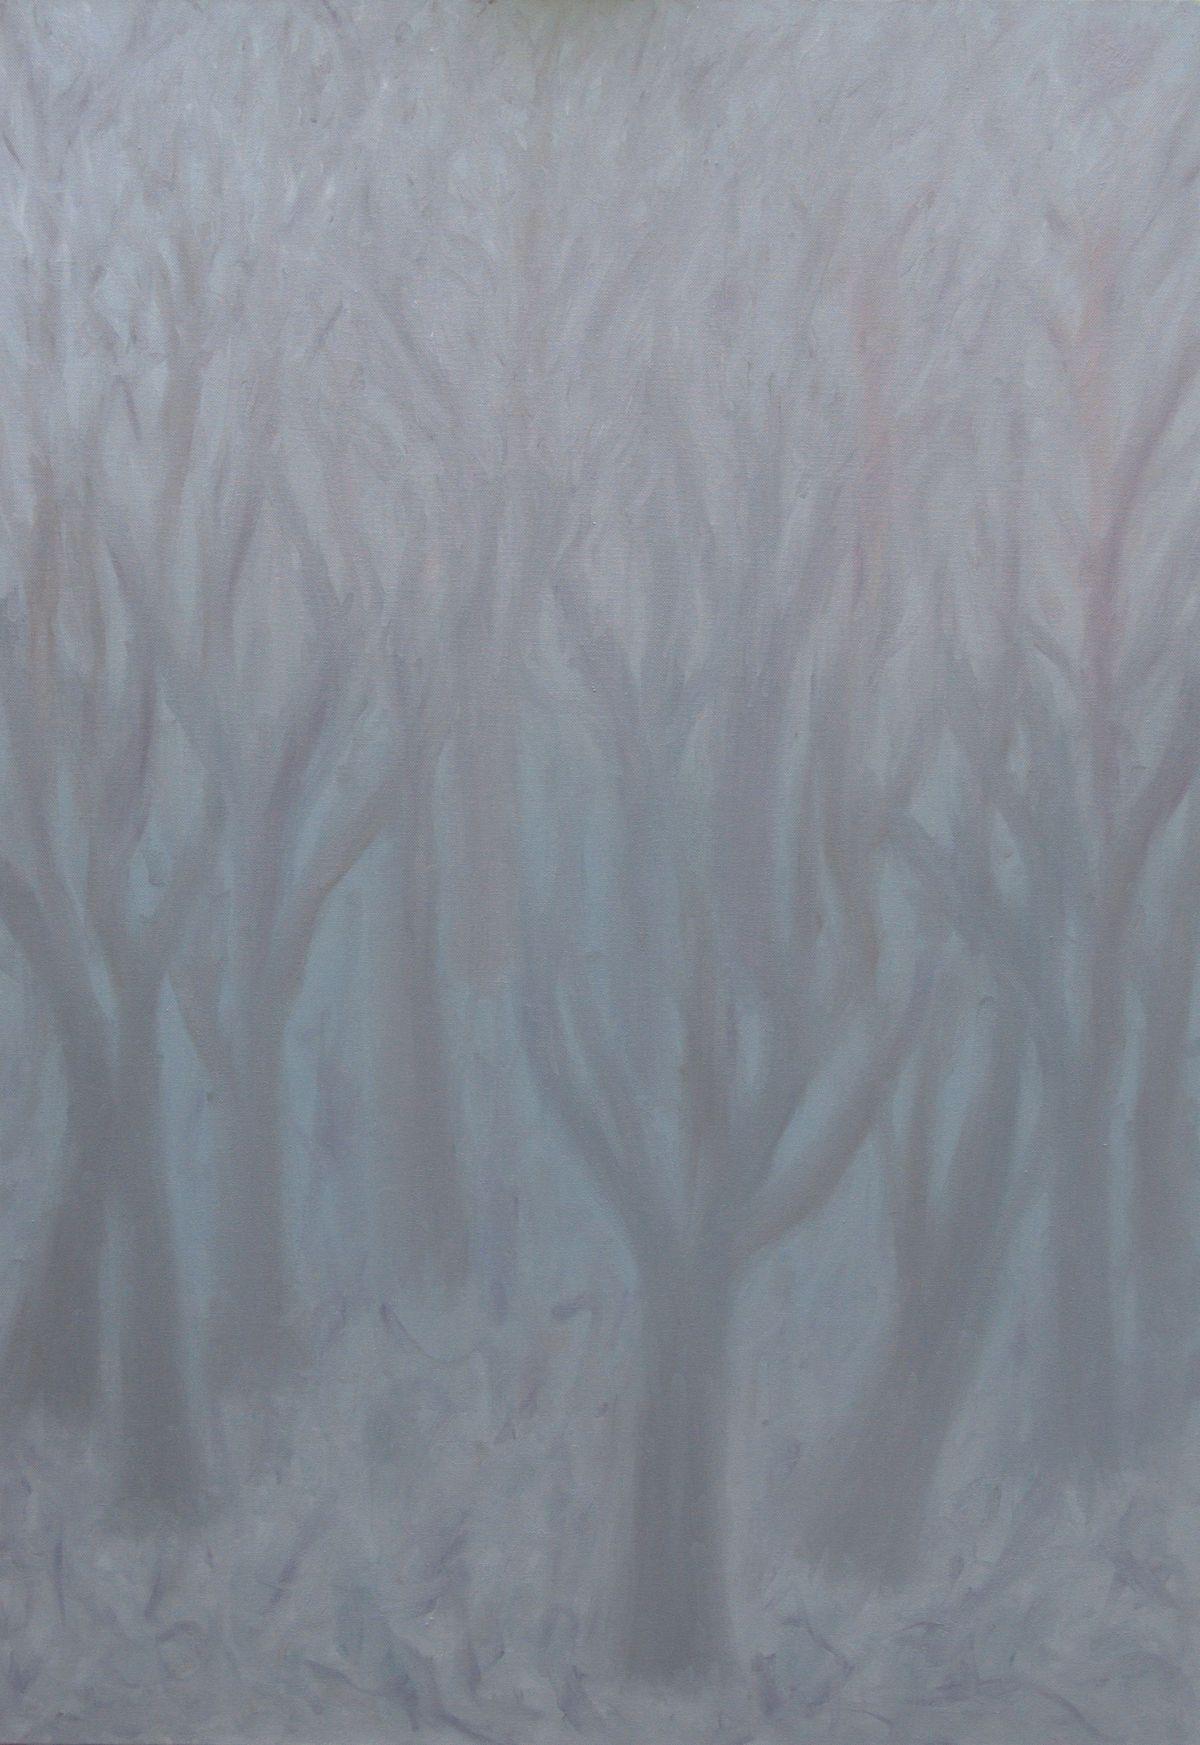 23 (olaj, vászon, 70x100 cm), 2009